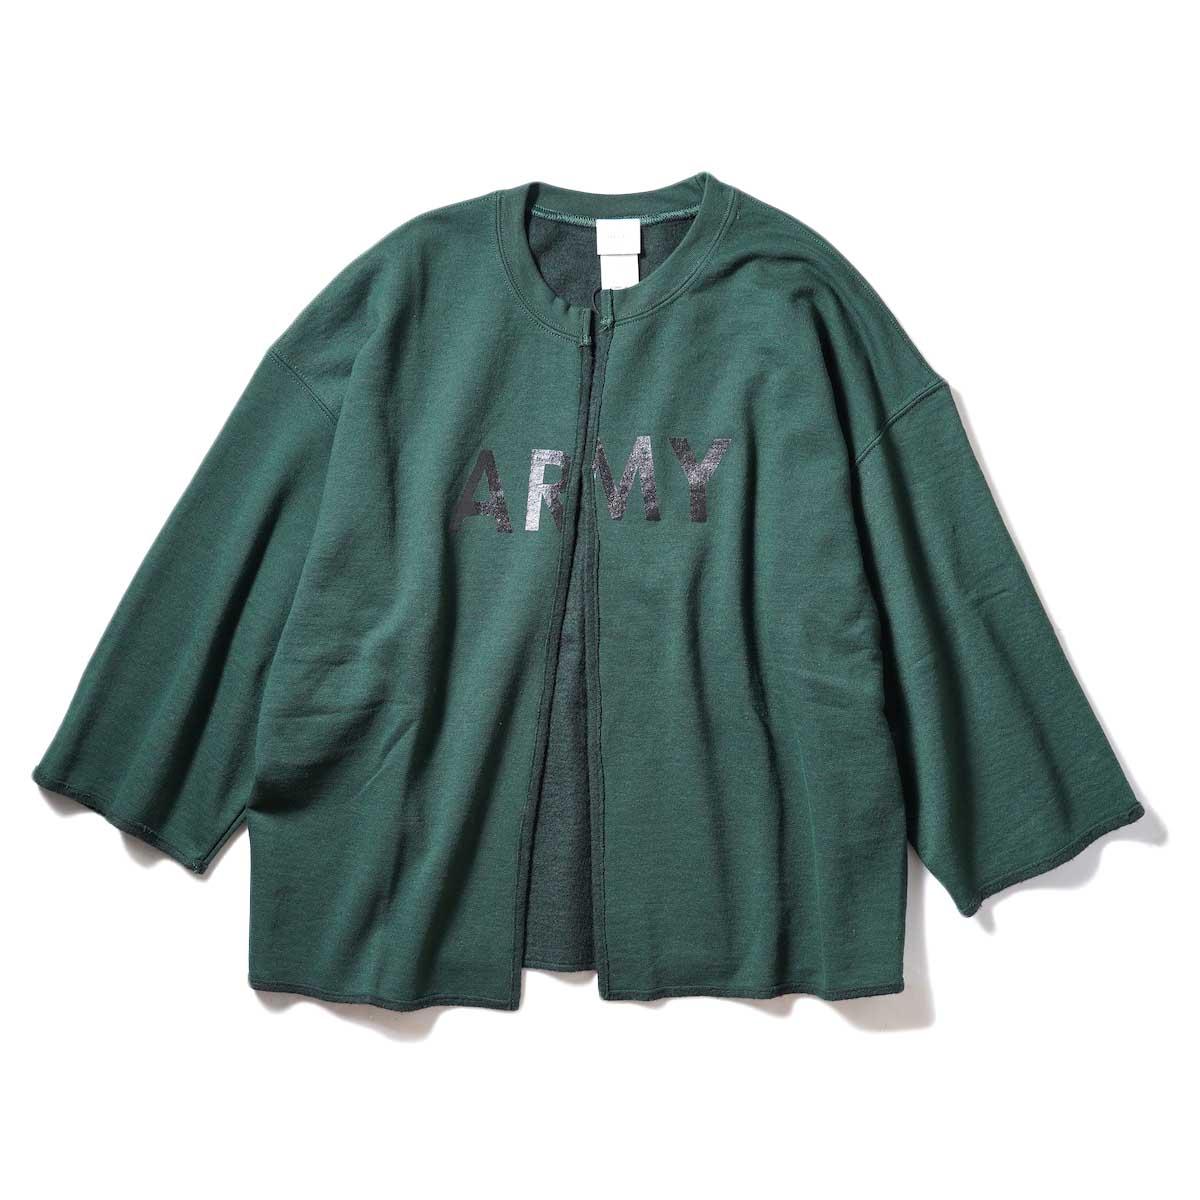 KHA:KI / REMAKE CARDIGAN (Green)